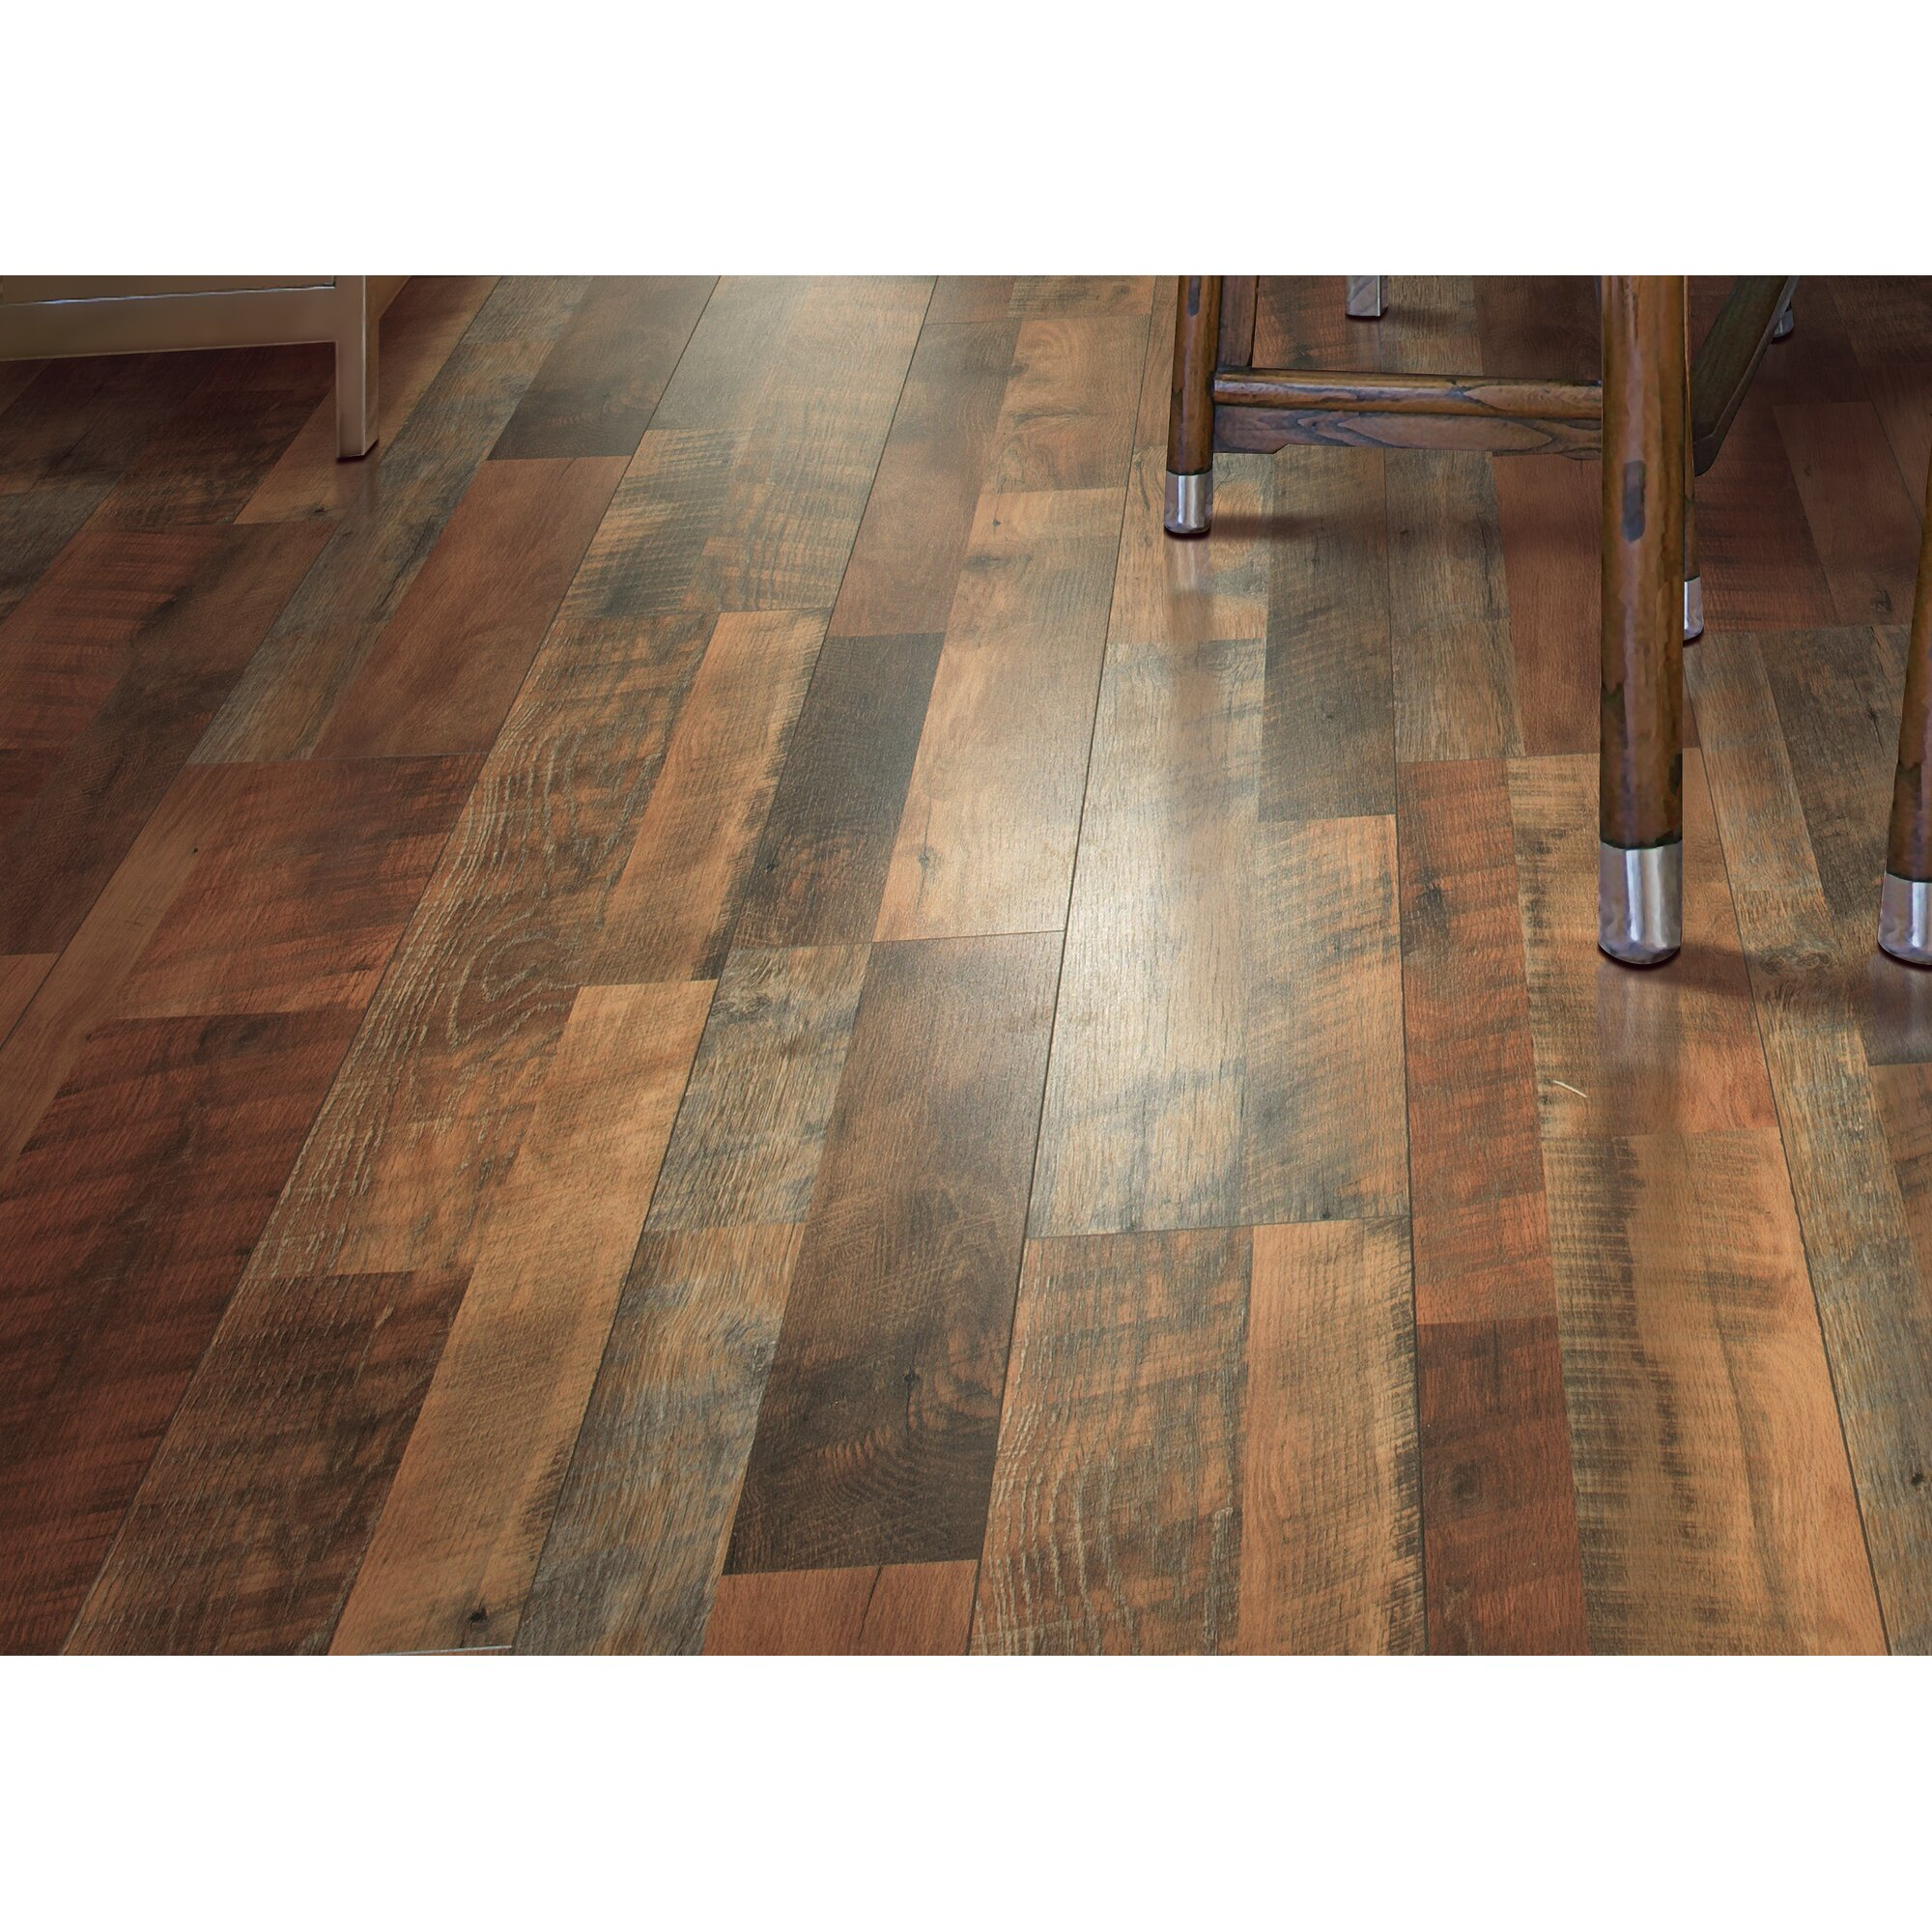 Oak Laminate Flooring oak 3 strip laminate Cashe Hills 8 X 47 X 787mm Oak Laminate